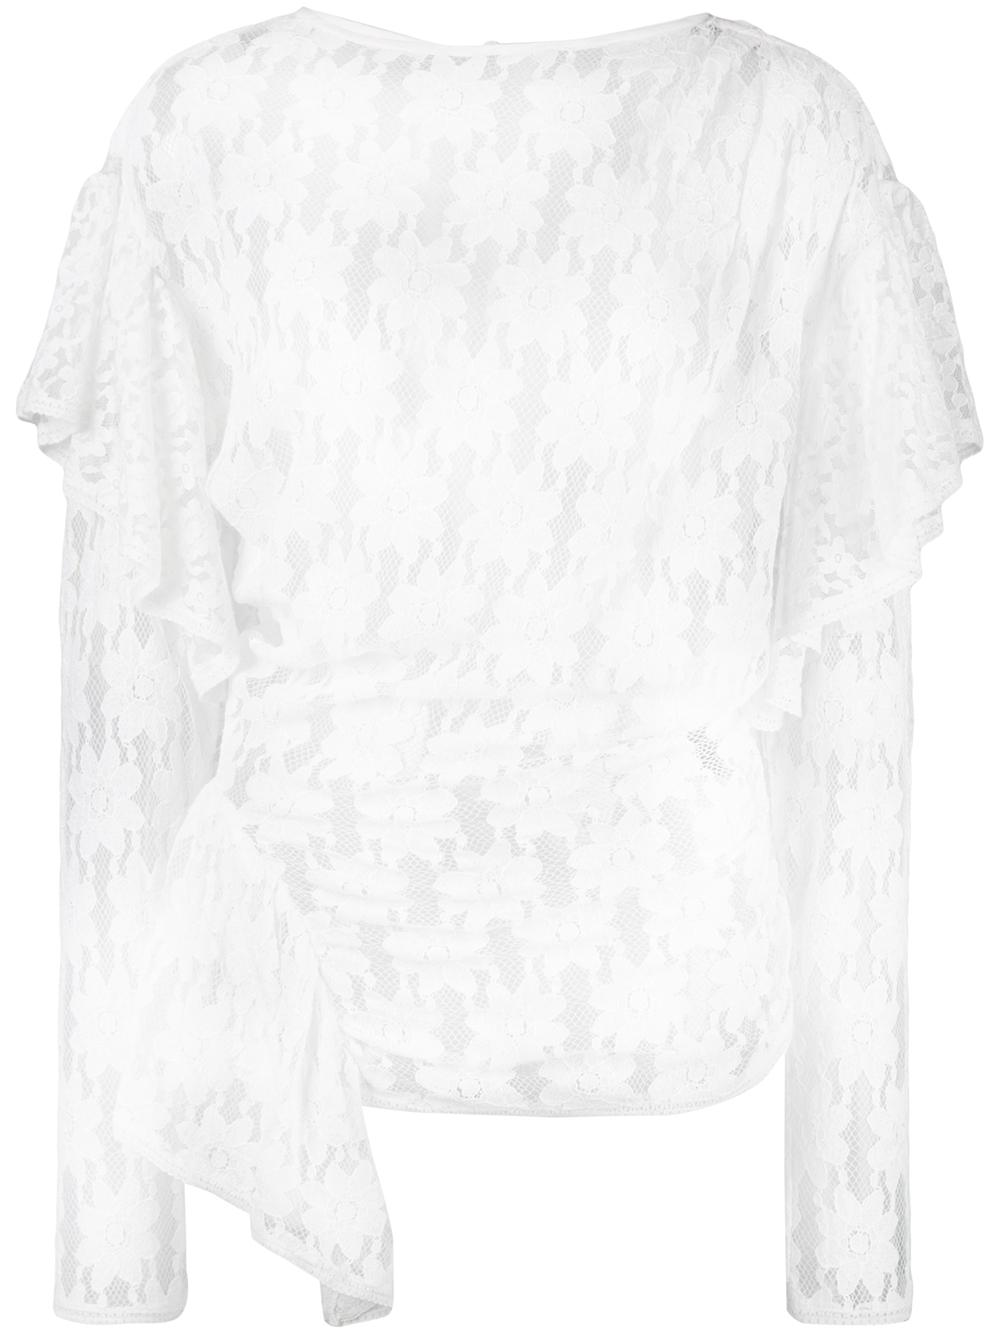 Long Sleeve Draped Lace Top